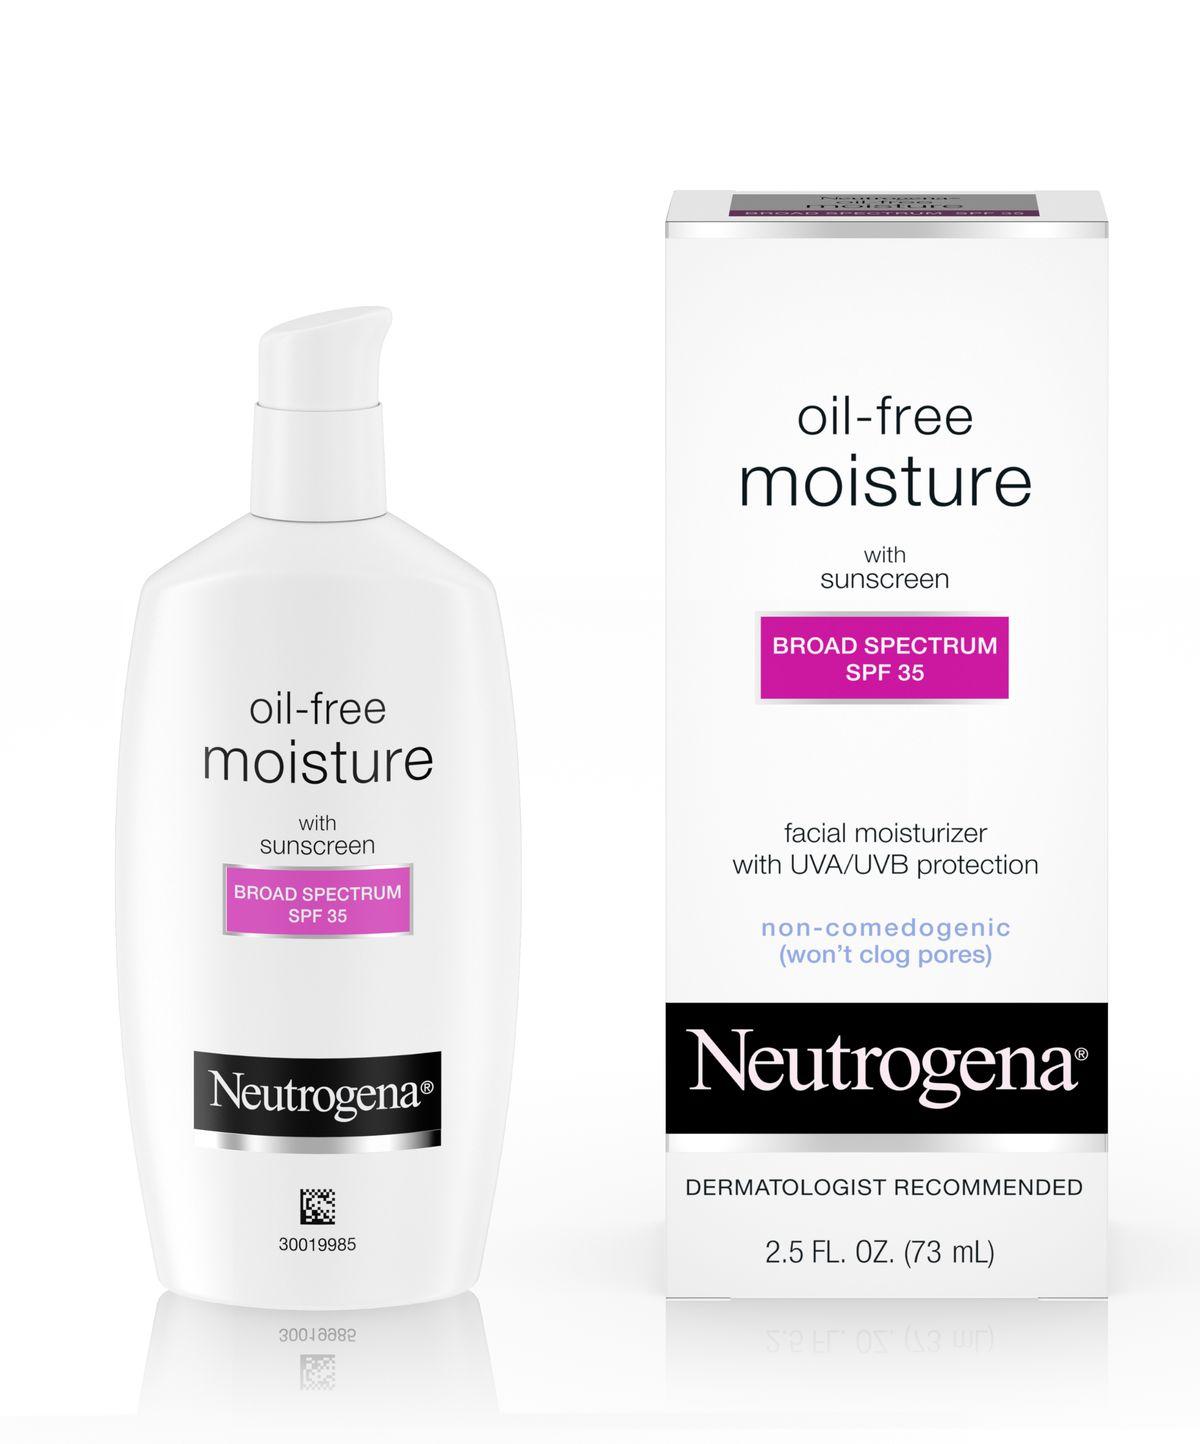 Neutrogena - Sunscreen